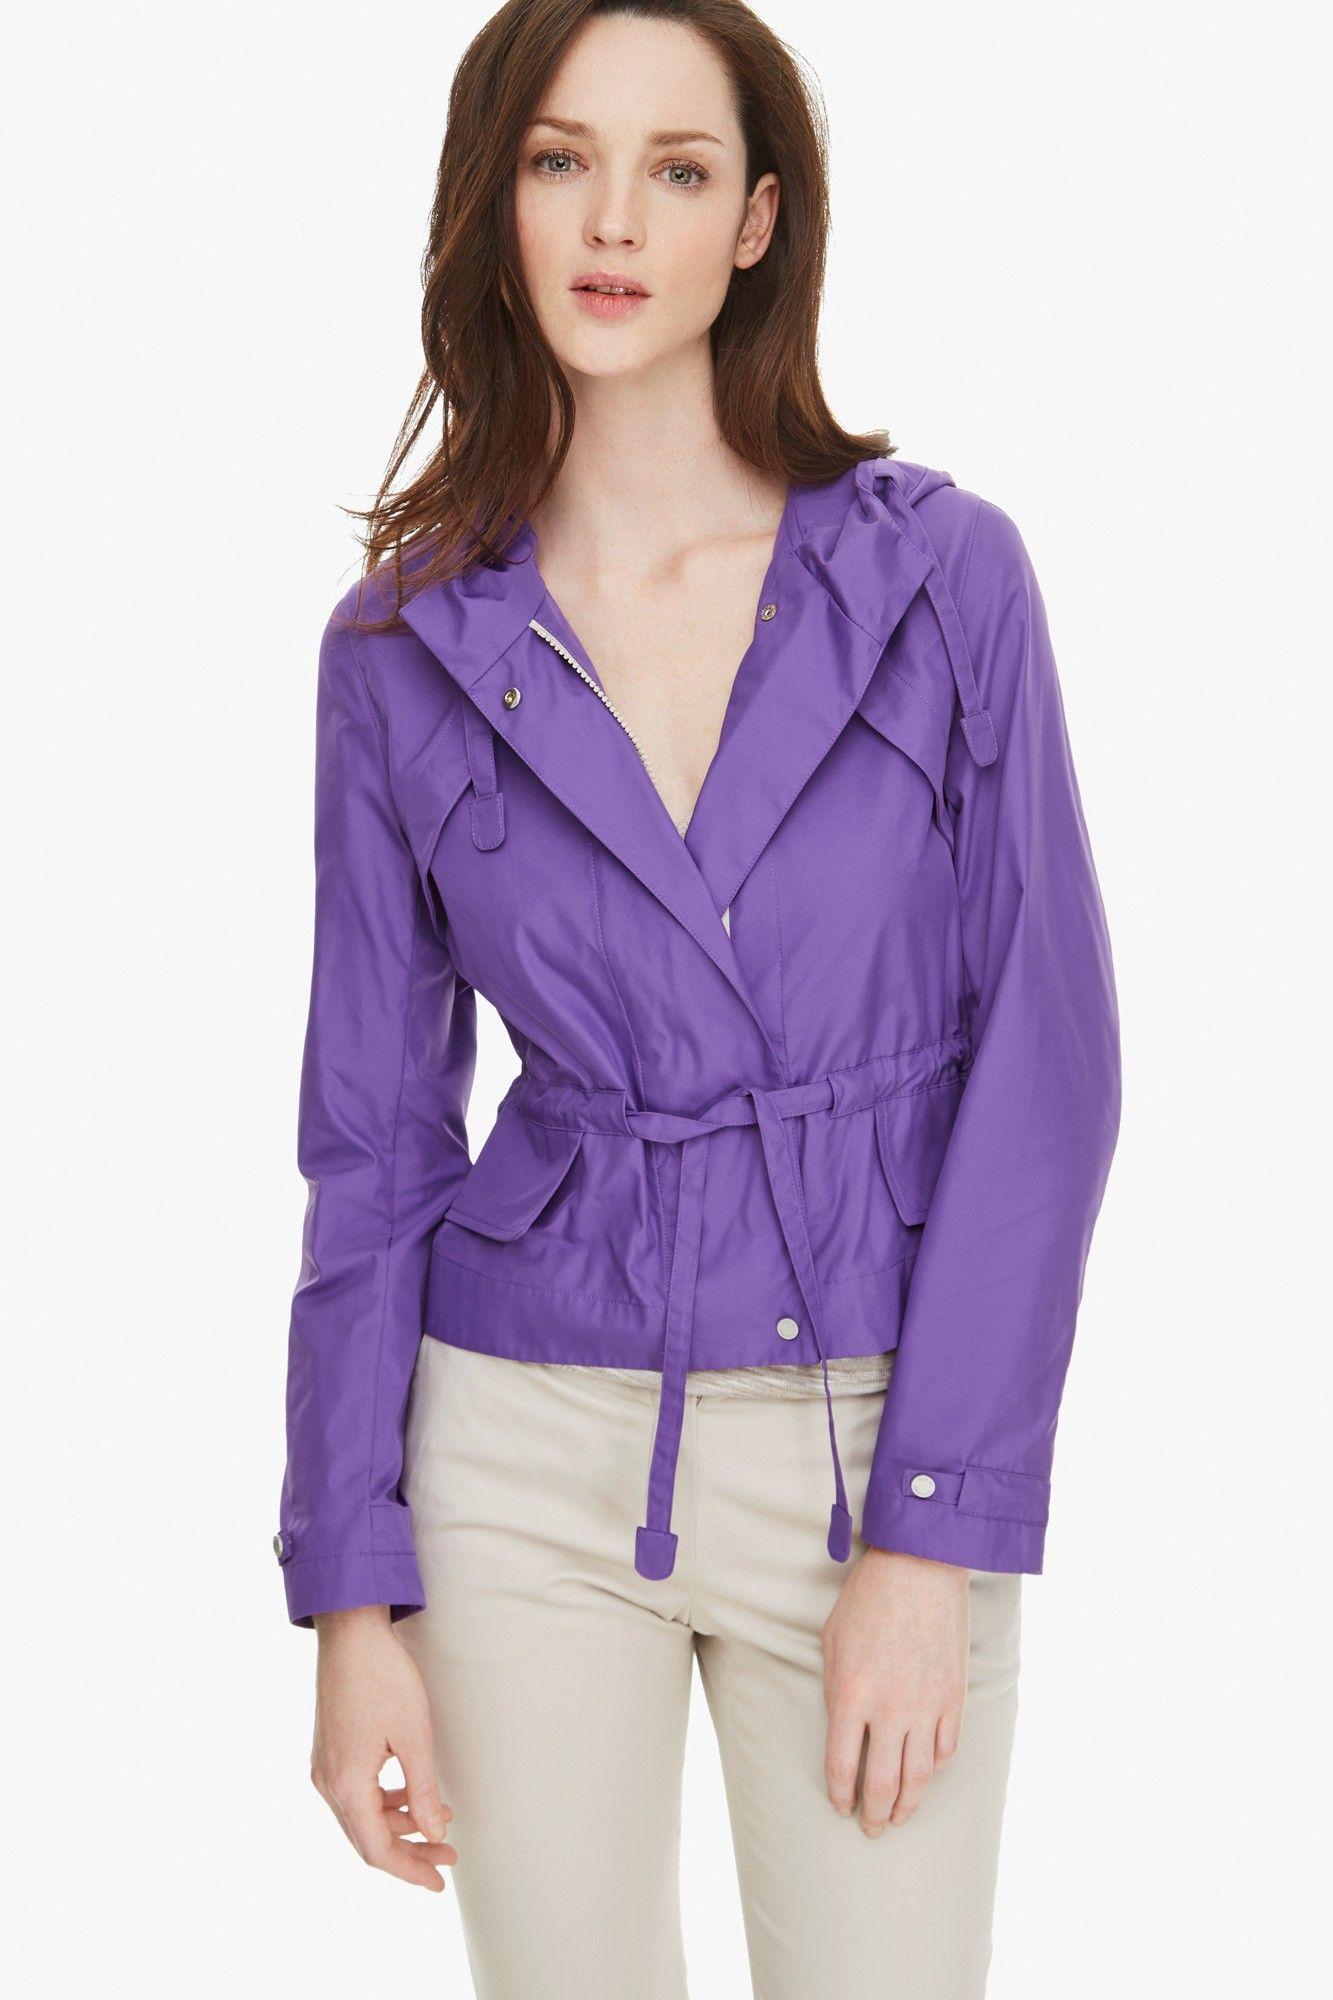 Cazadora capucha textura - chaquetas & chalecos | Adolfo Dominguez ...